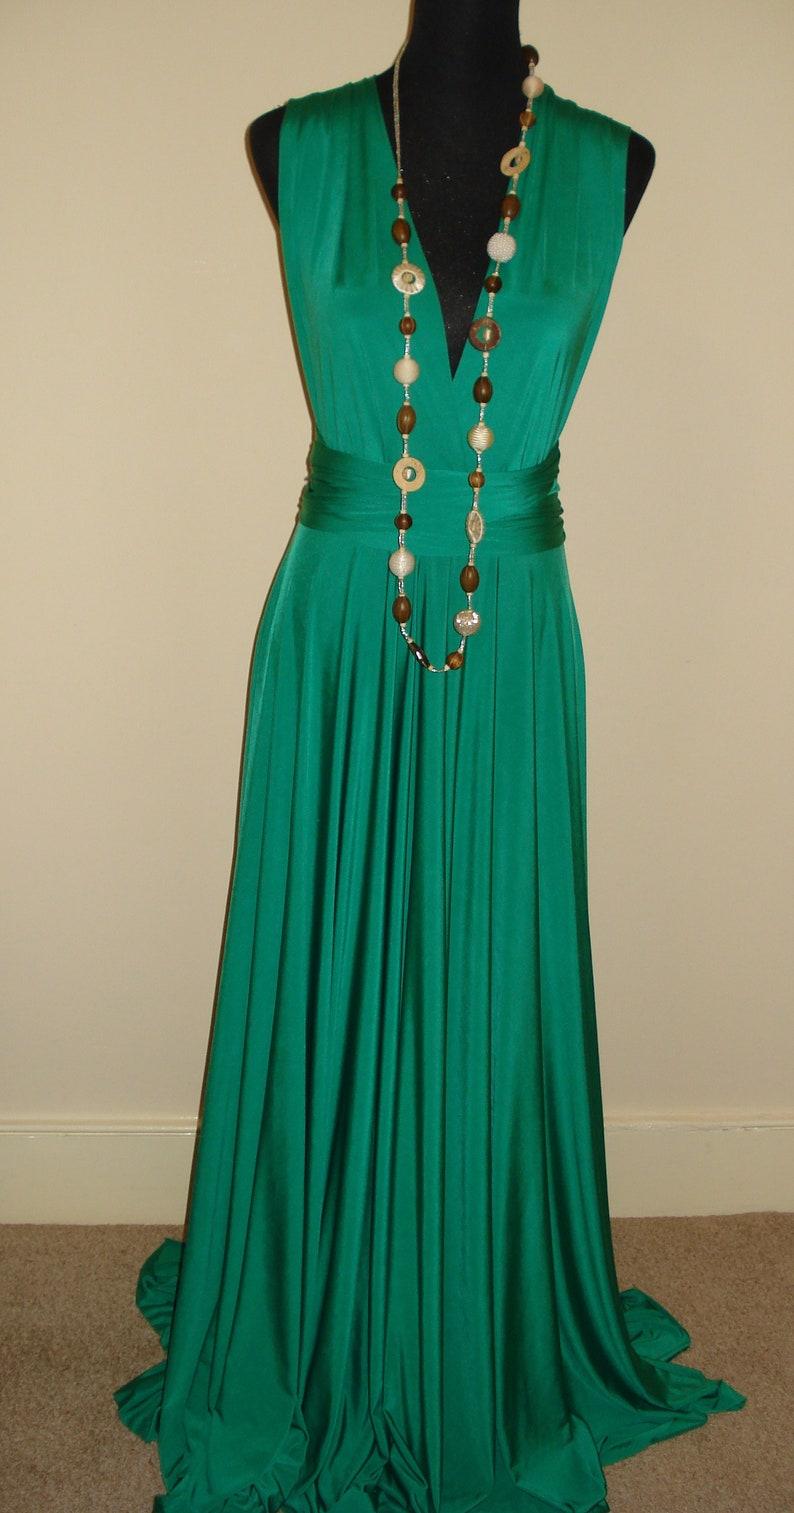 3c33c2d5fbc Emerald Green Infinity Convertible Dress Multiway Dress